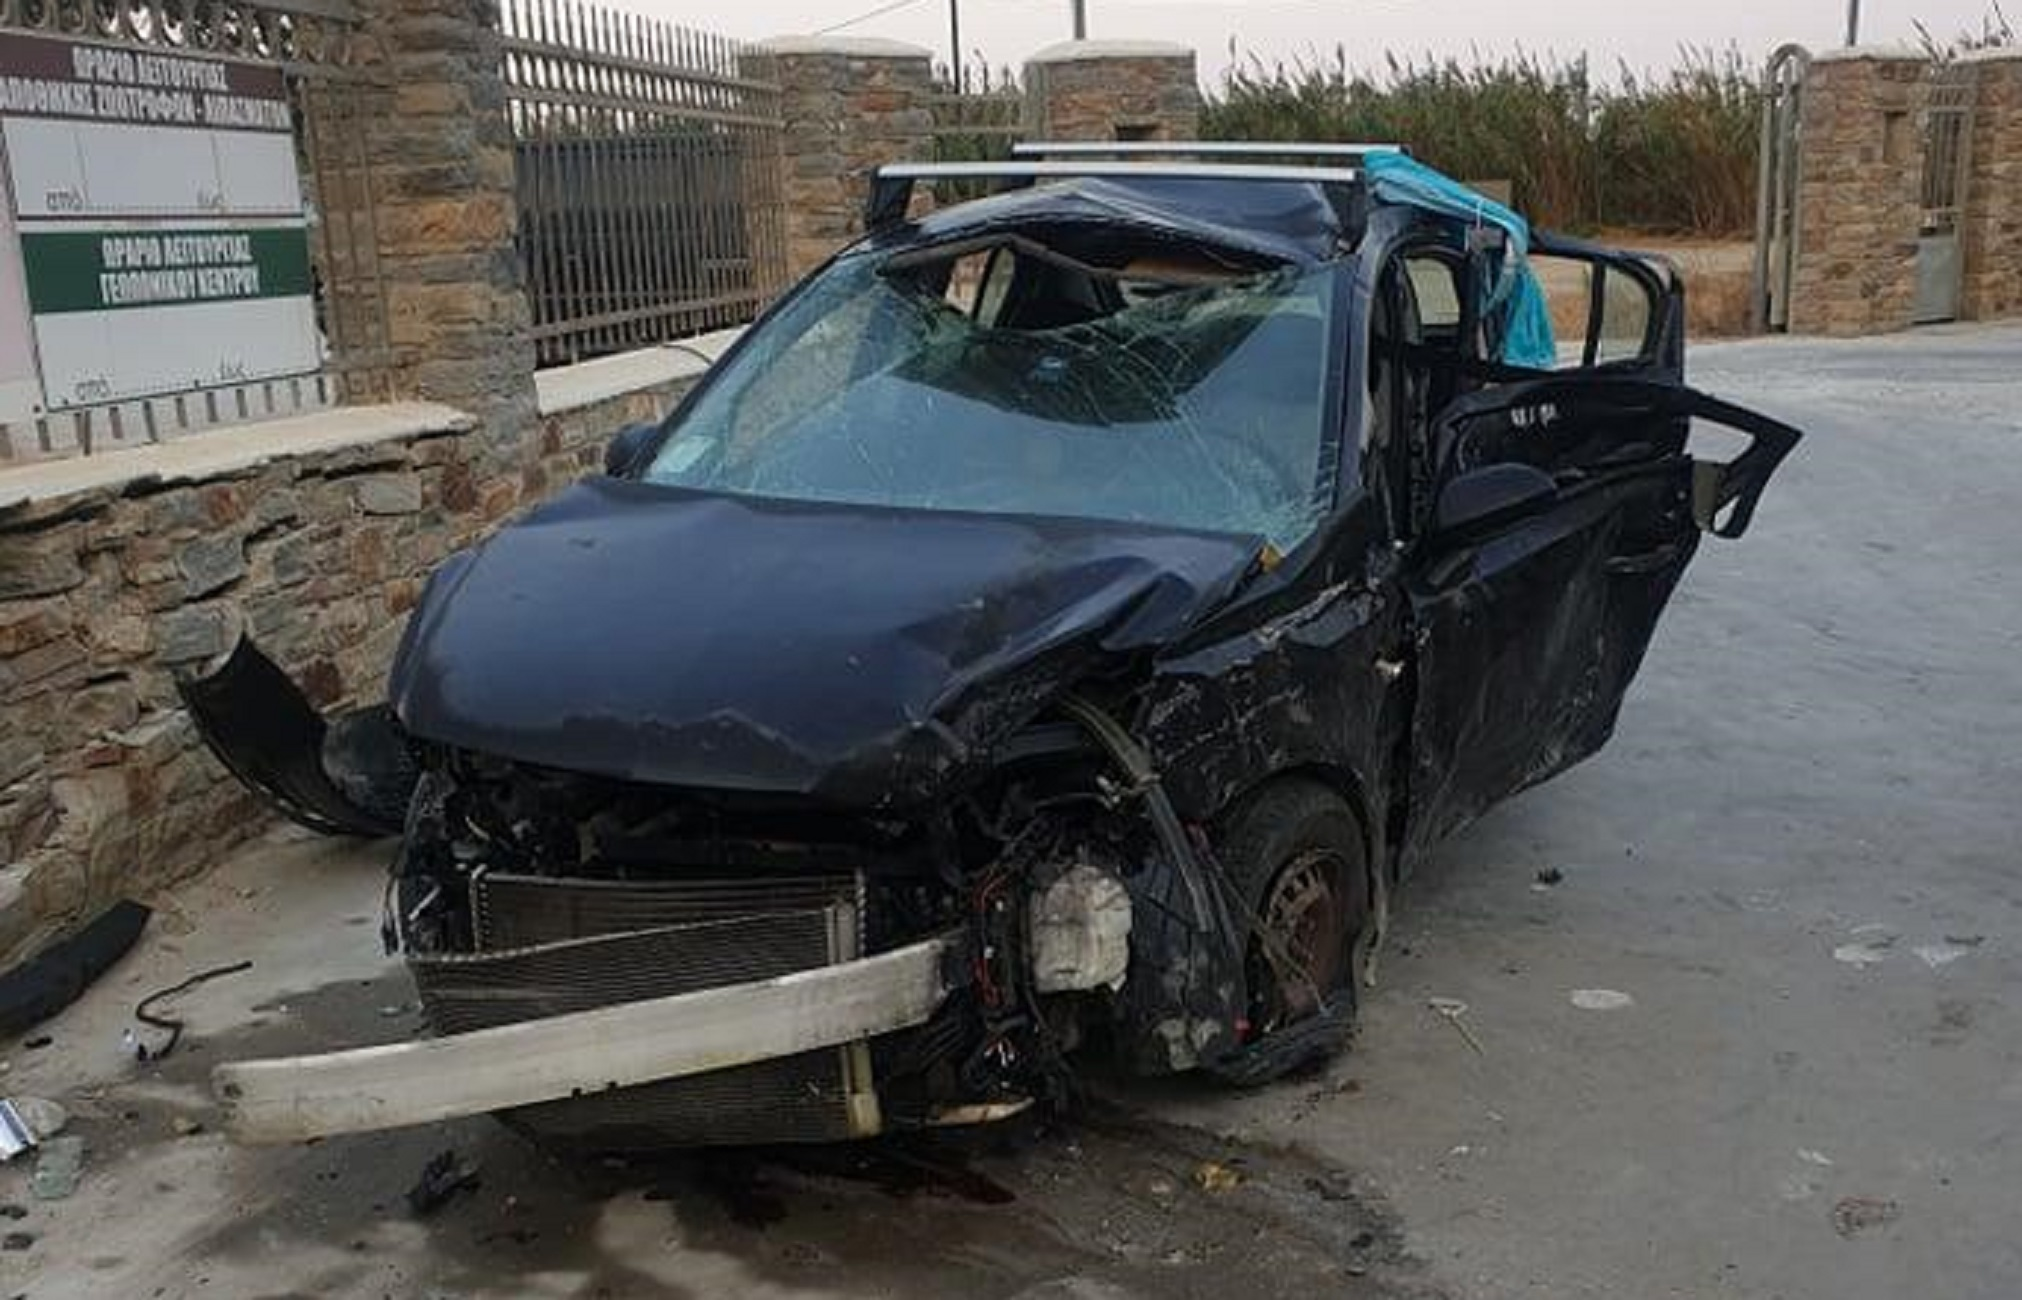 NAXOS TROXAIO 2 1 - Οικογενειακή τραγωδία σε θανατηφόρο τροχαίο – Νεκρή η μητέρα